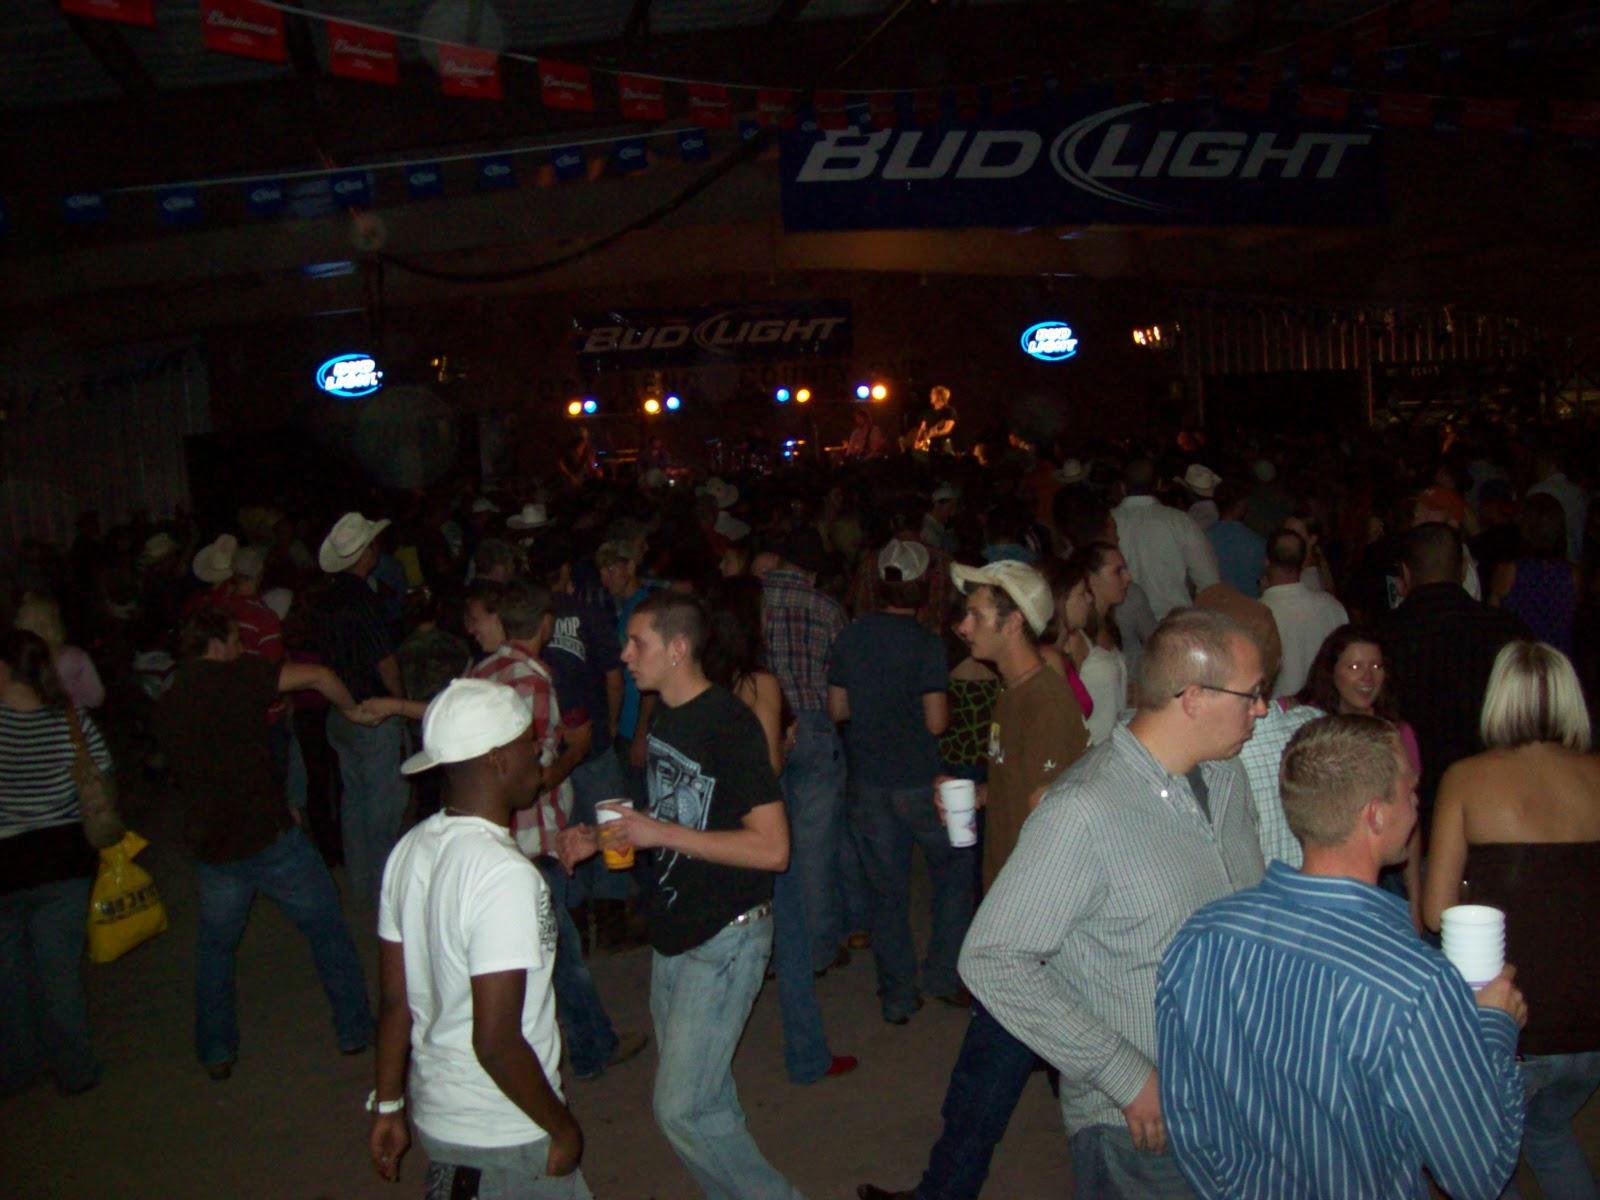 Fort Bend County Fair - 101_5467.JPG